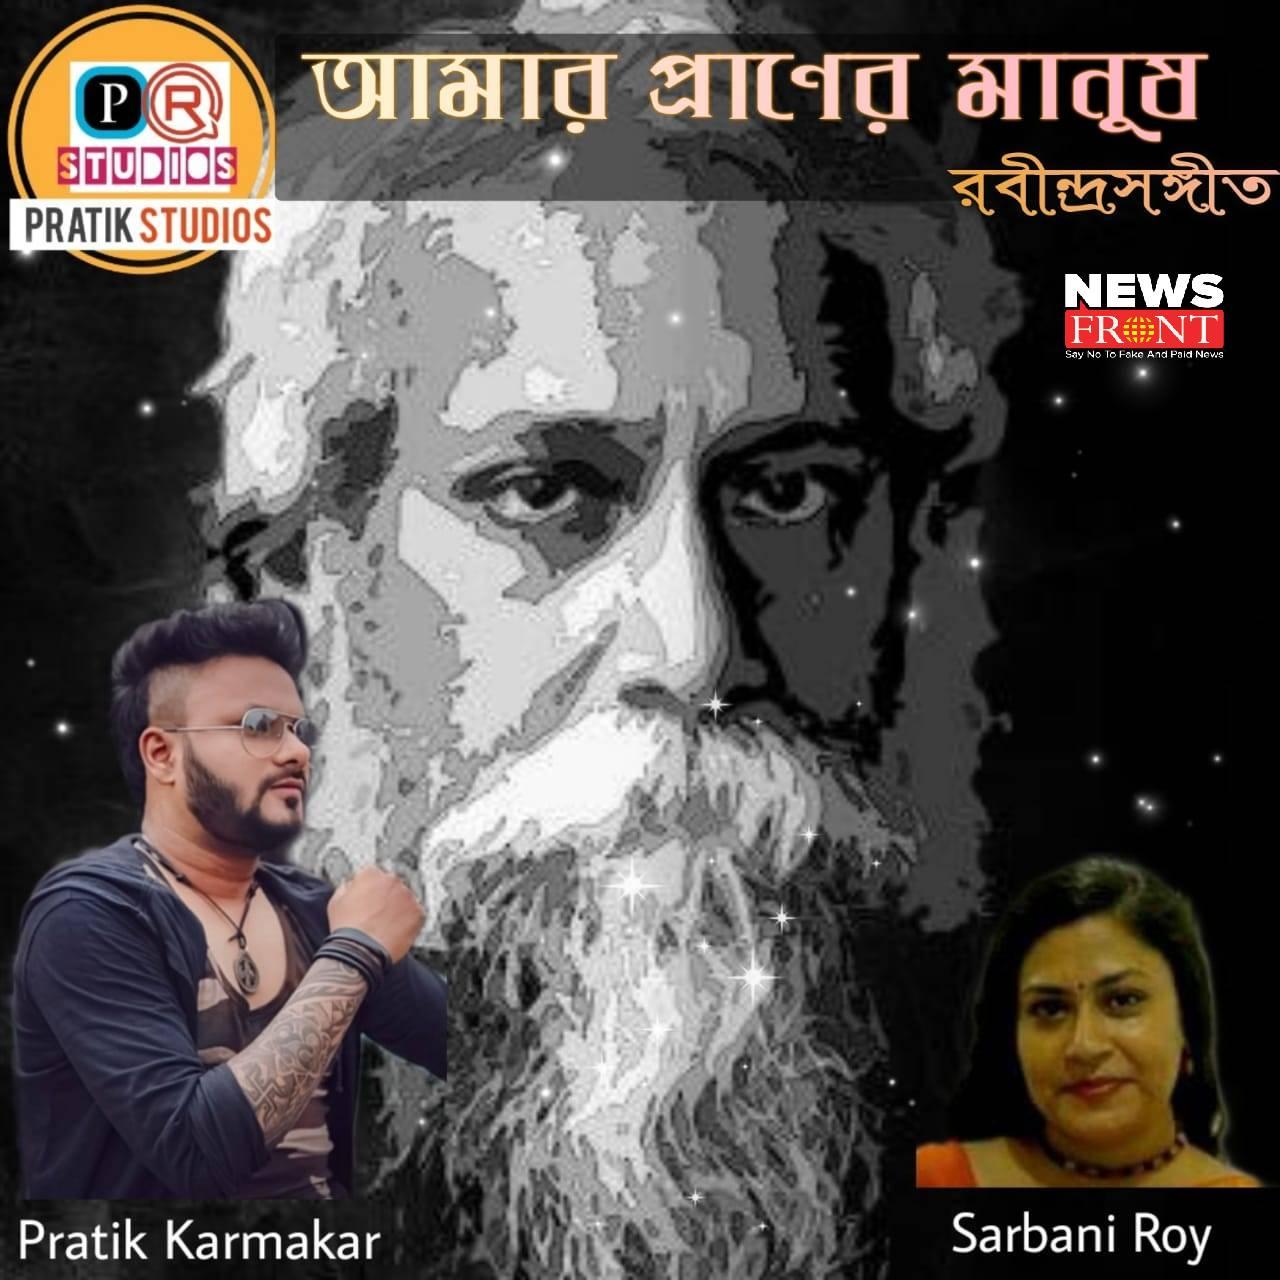 rabindra sangeet | newsfront.co